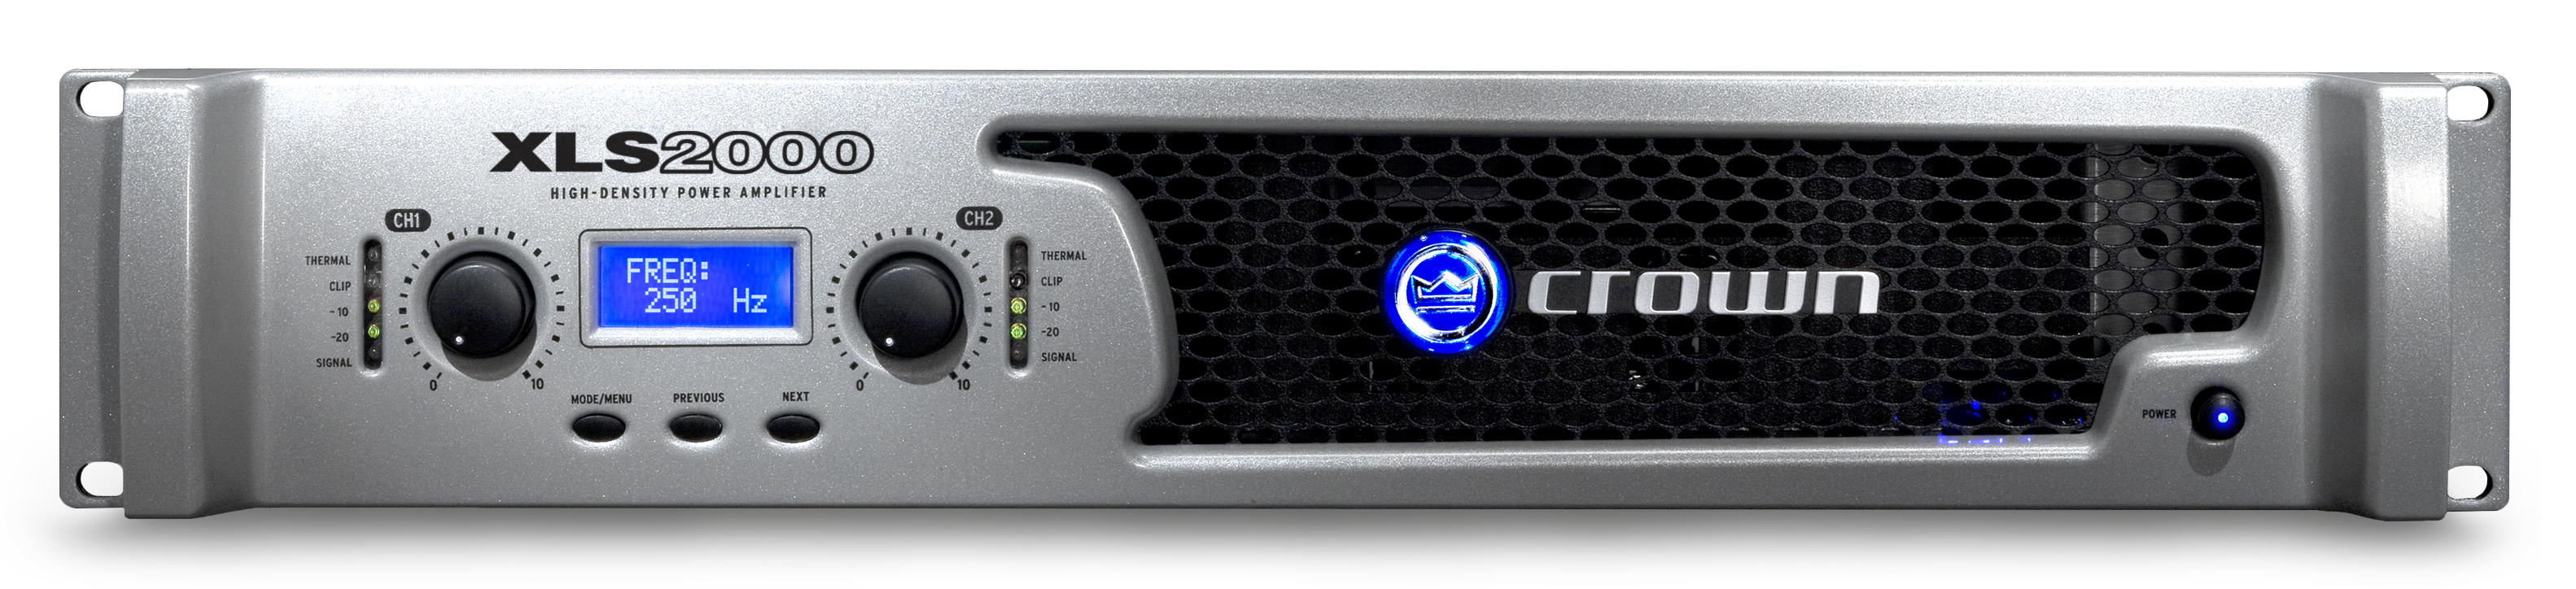 XLS 2000 | Crown Audio - Professional Power Amplifiers